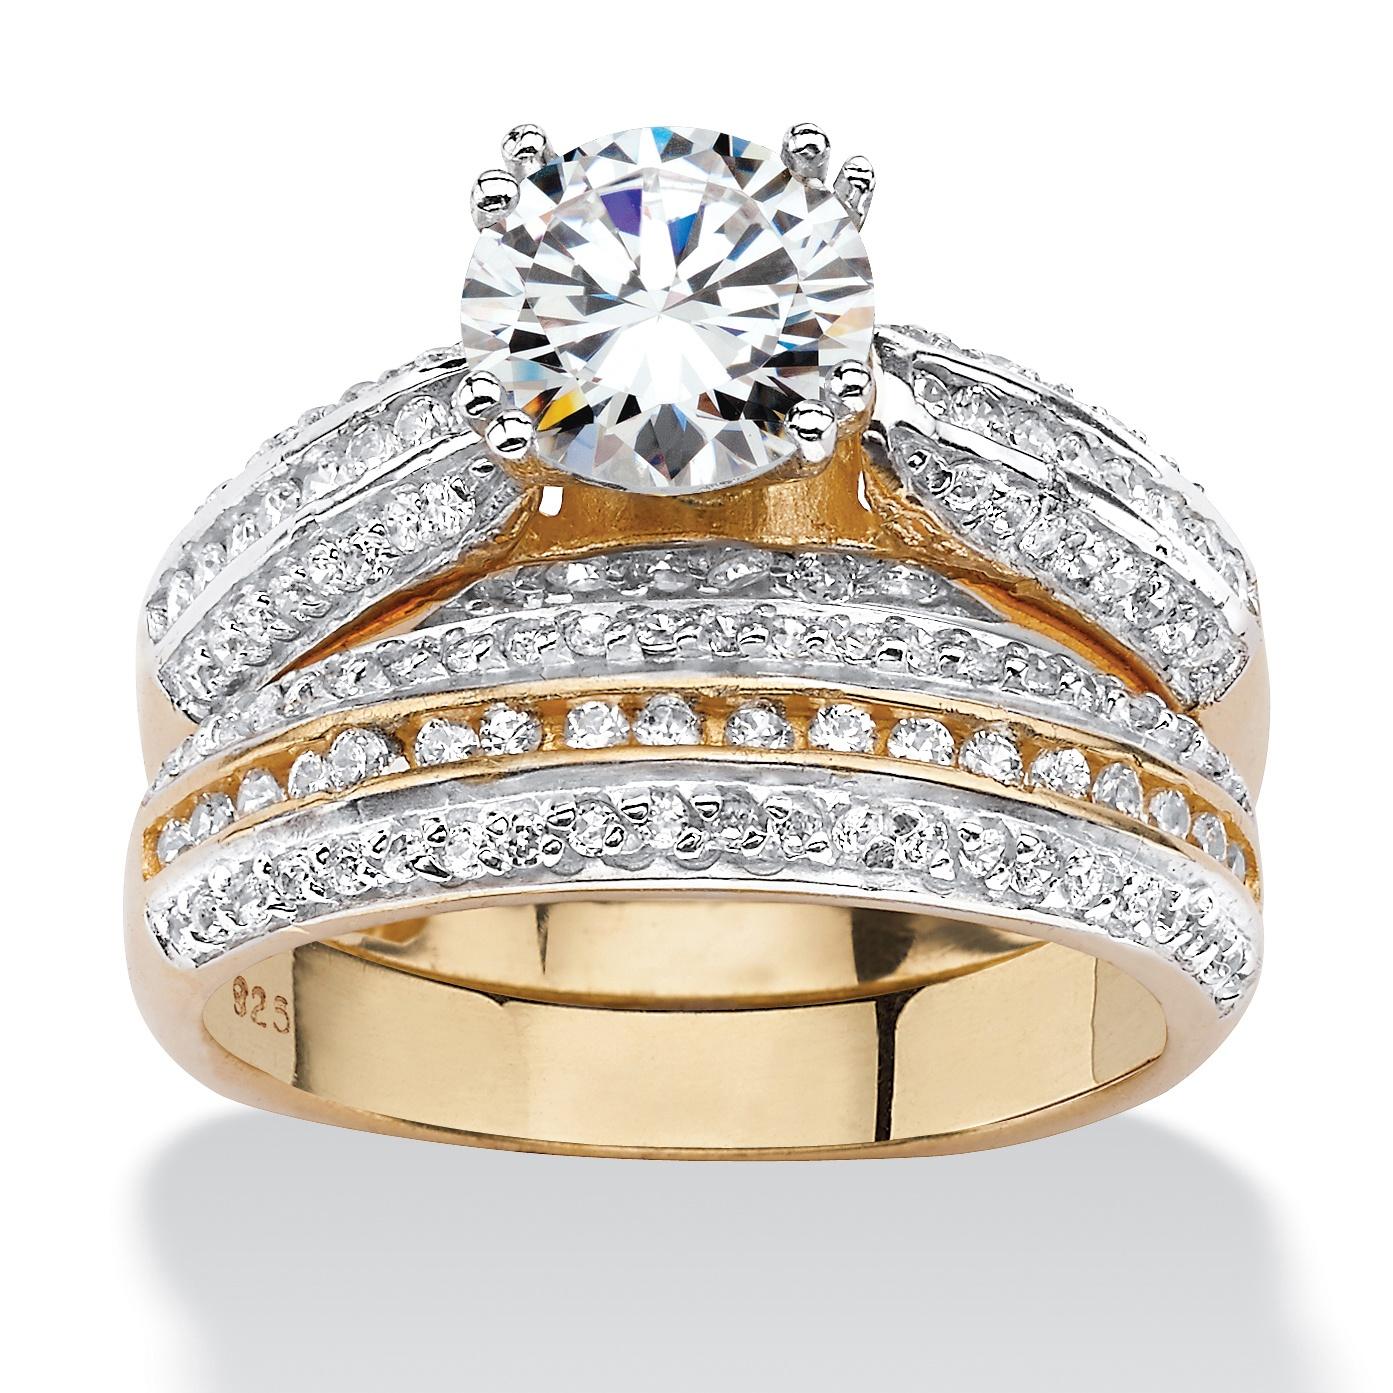 255 TCW Cubic Zirconia TwoPiece Bridal Set in18k Gold